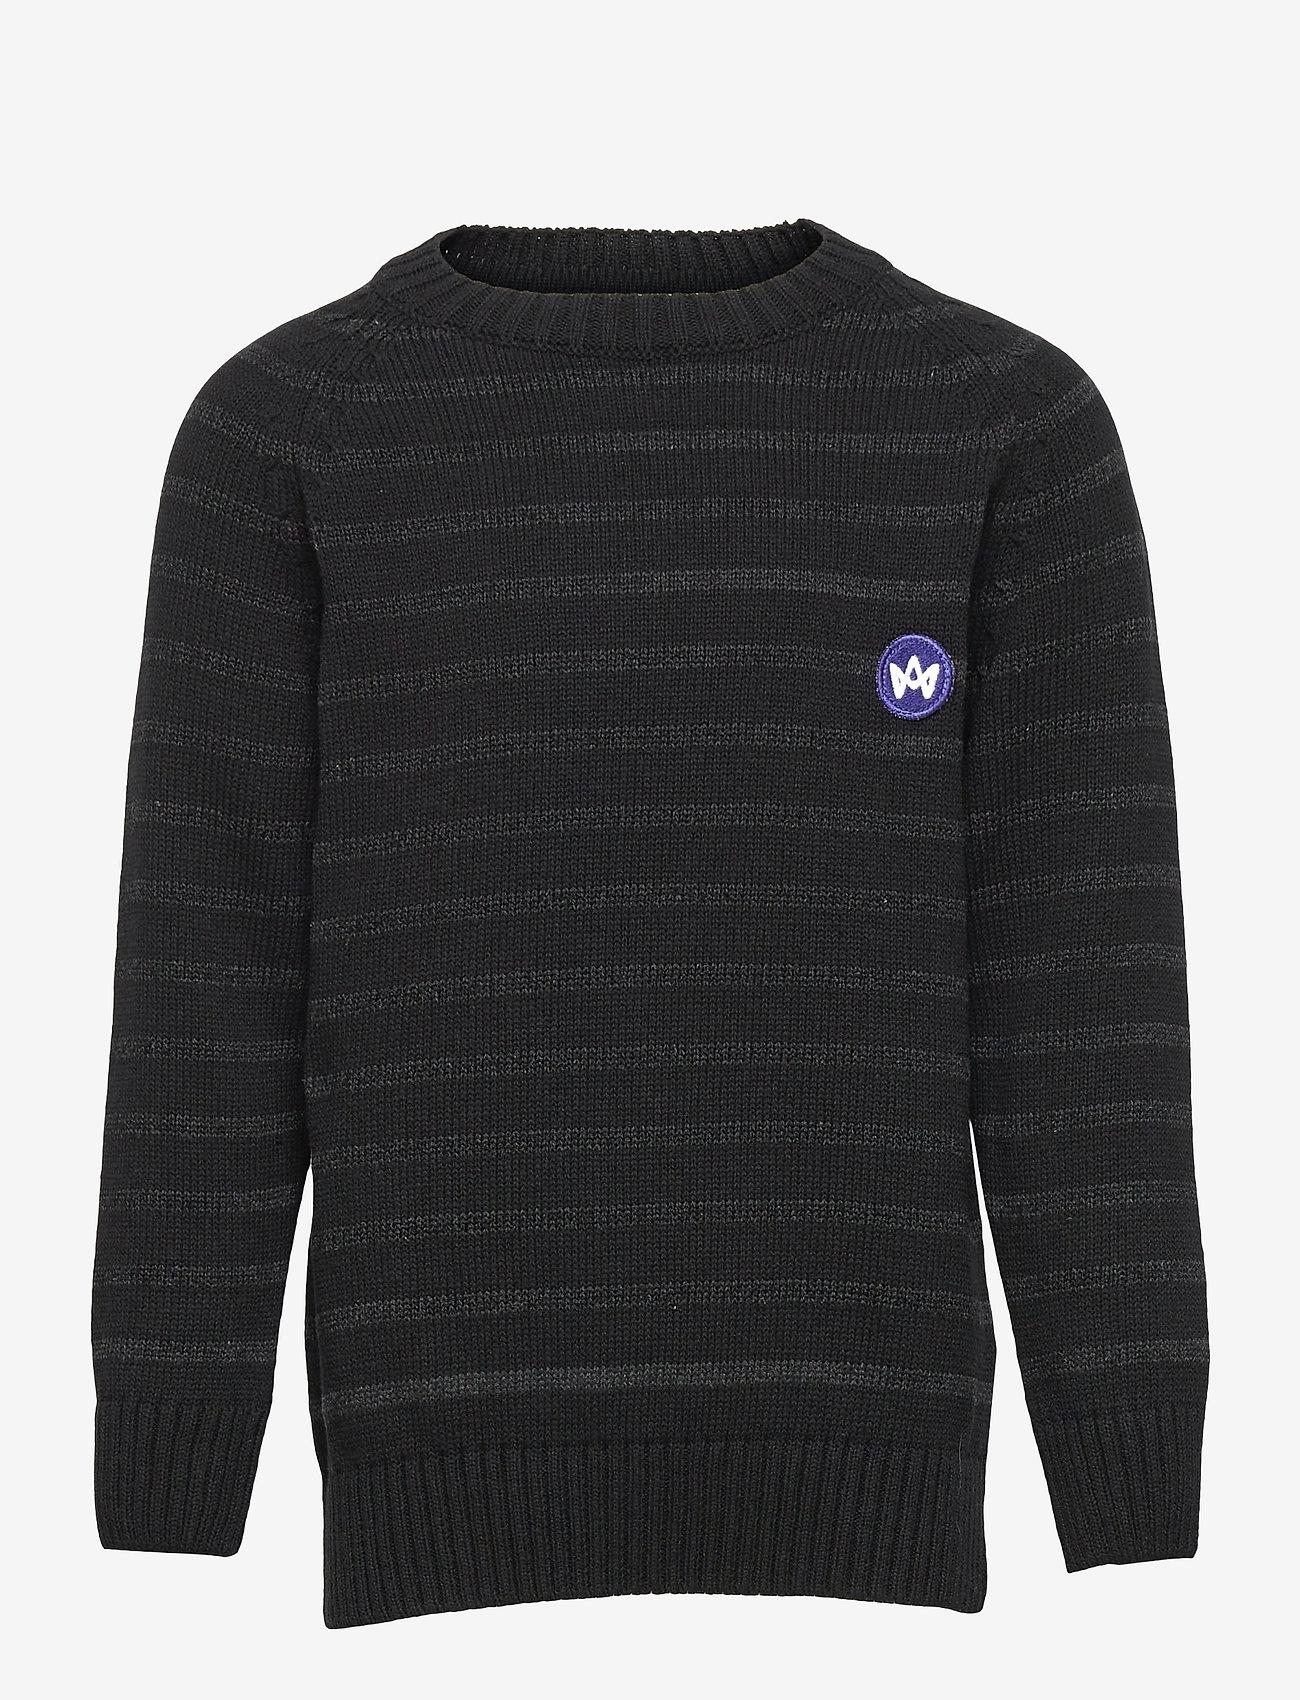 Kronstadt - Liam Crew Stripe Recycle - jumpers - black/charcoal - 0